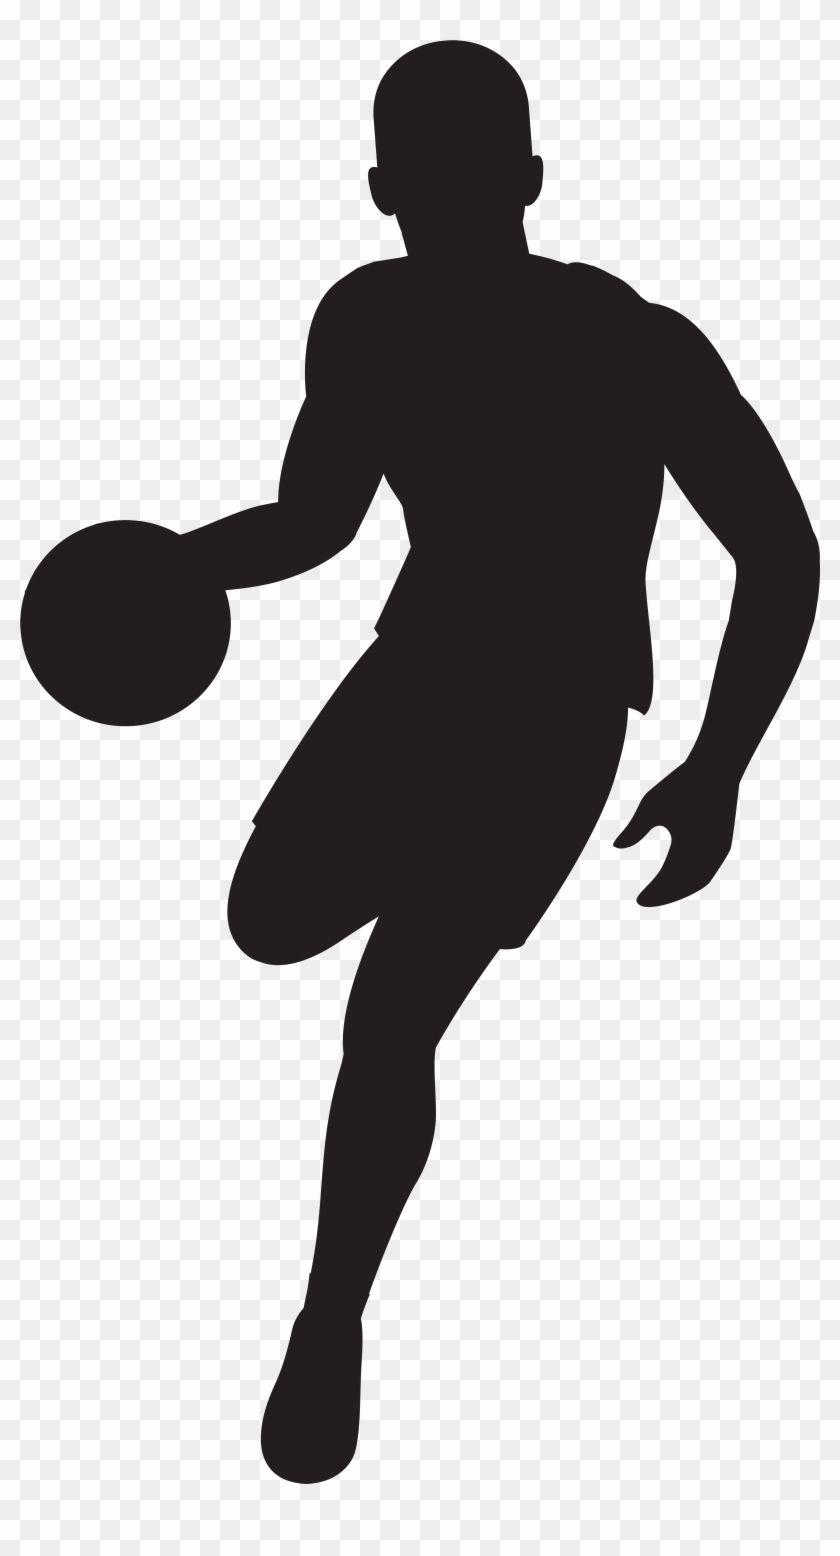 Basketball Player Silhouette Clip Art Image Basketball Player Silhouette Png Transparent Png Is Best Quality And H Silhouette Silhouette Png Silhouette Art